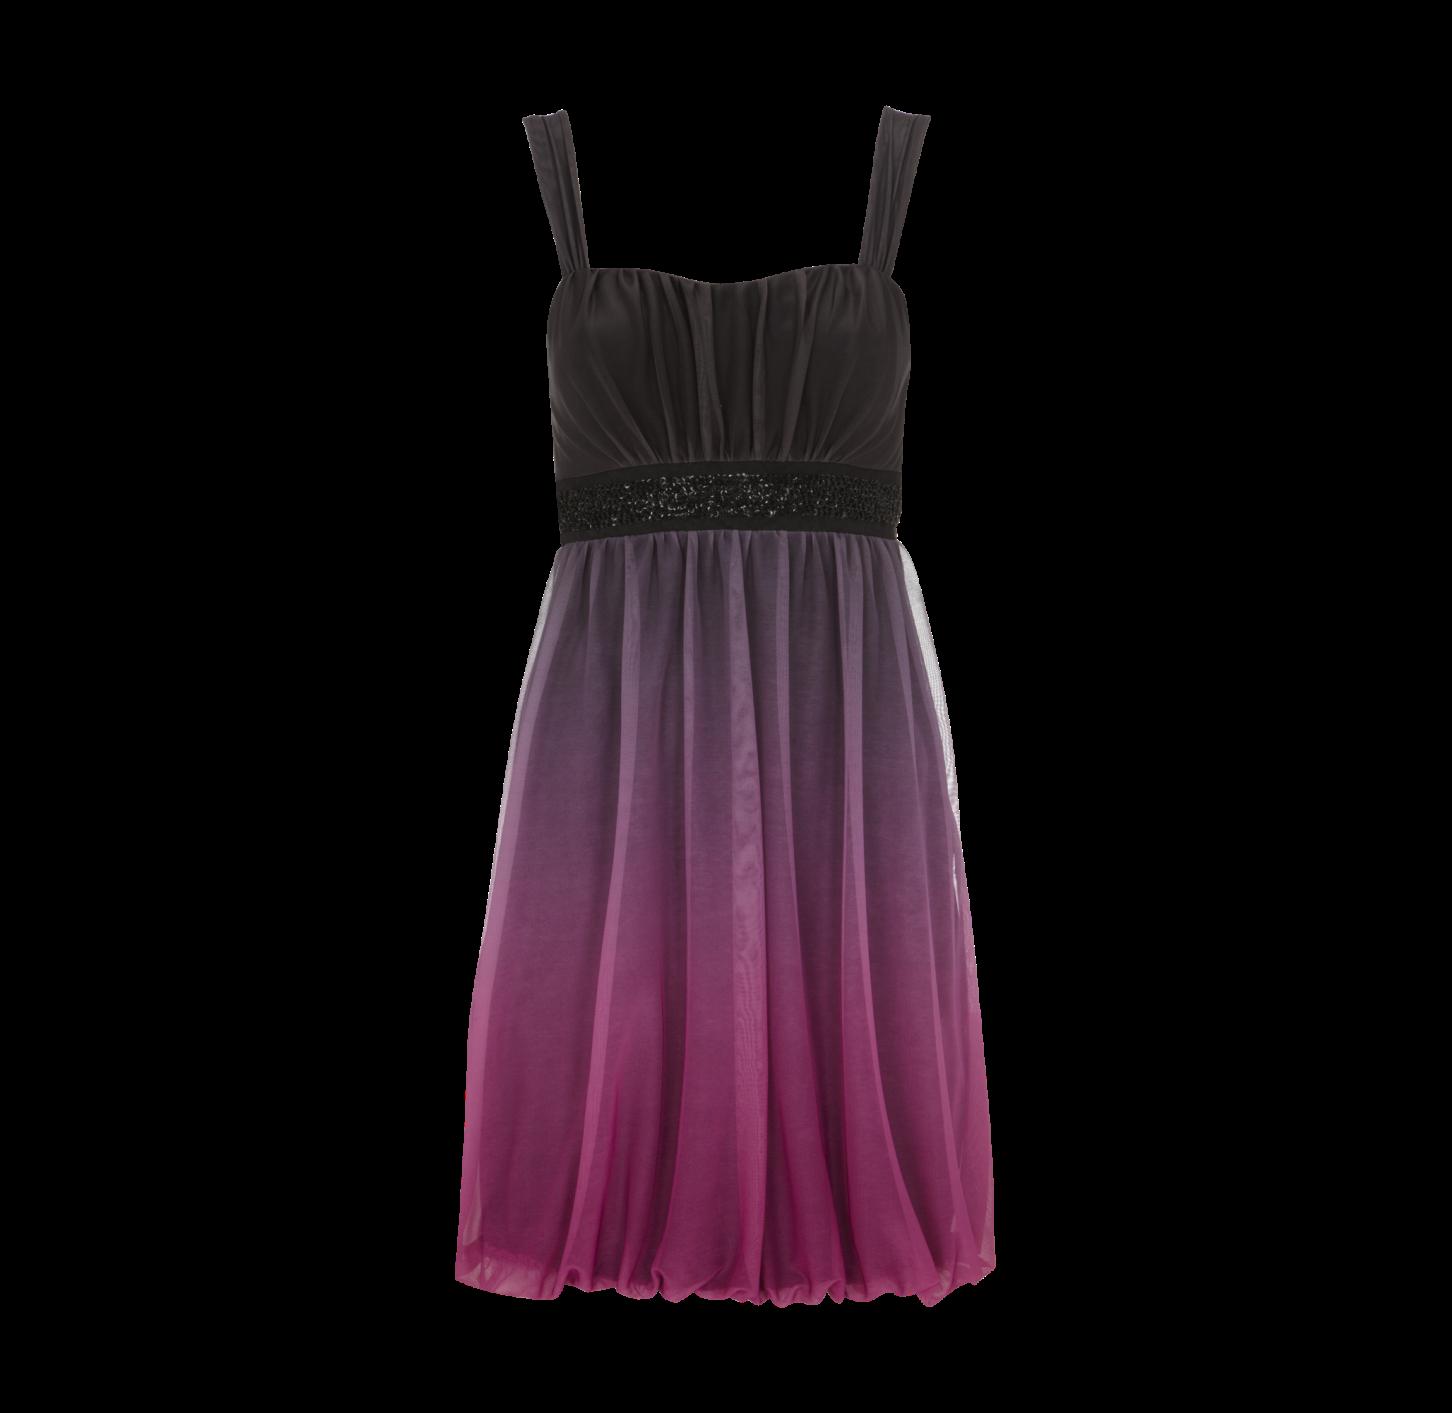 MONTEGO - Kleid mit dekorativer Applikation - Peek ...